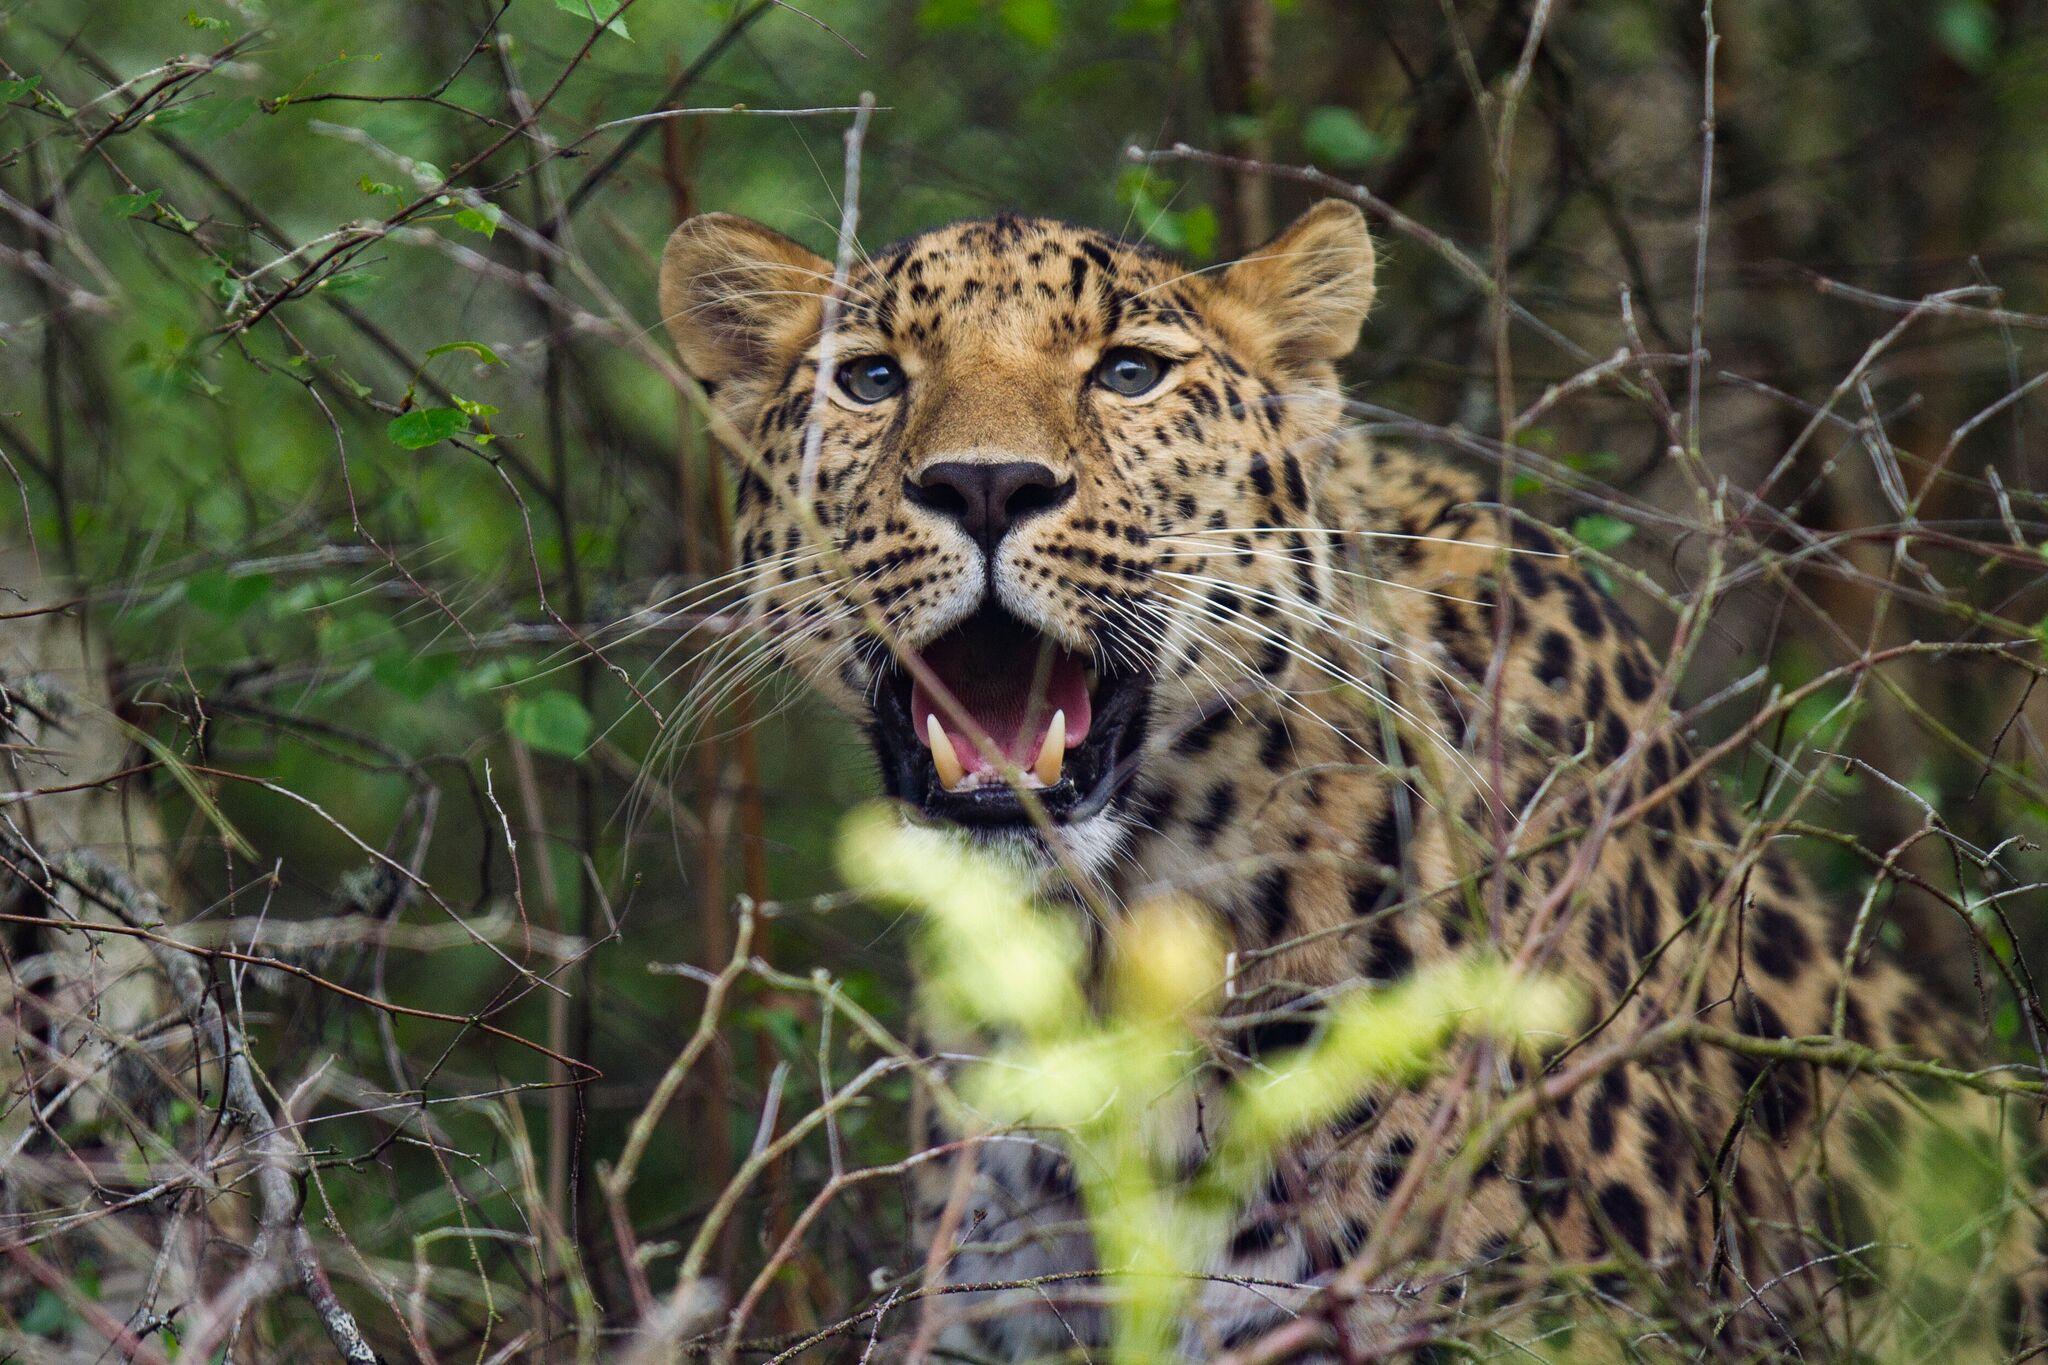 Freddo is an amur leopard. Photo by RZSS